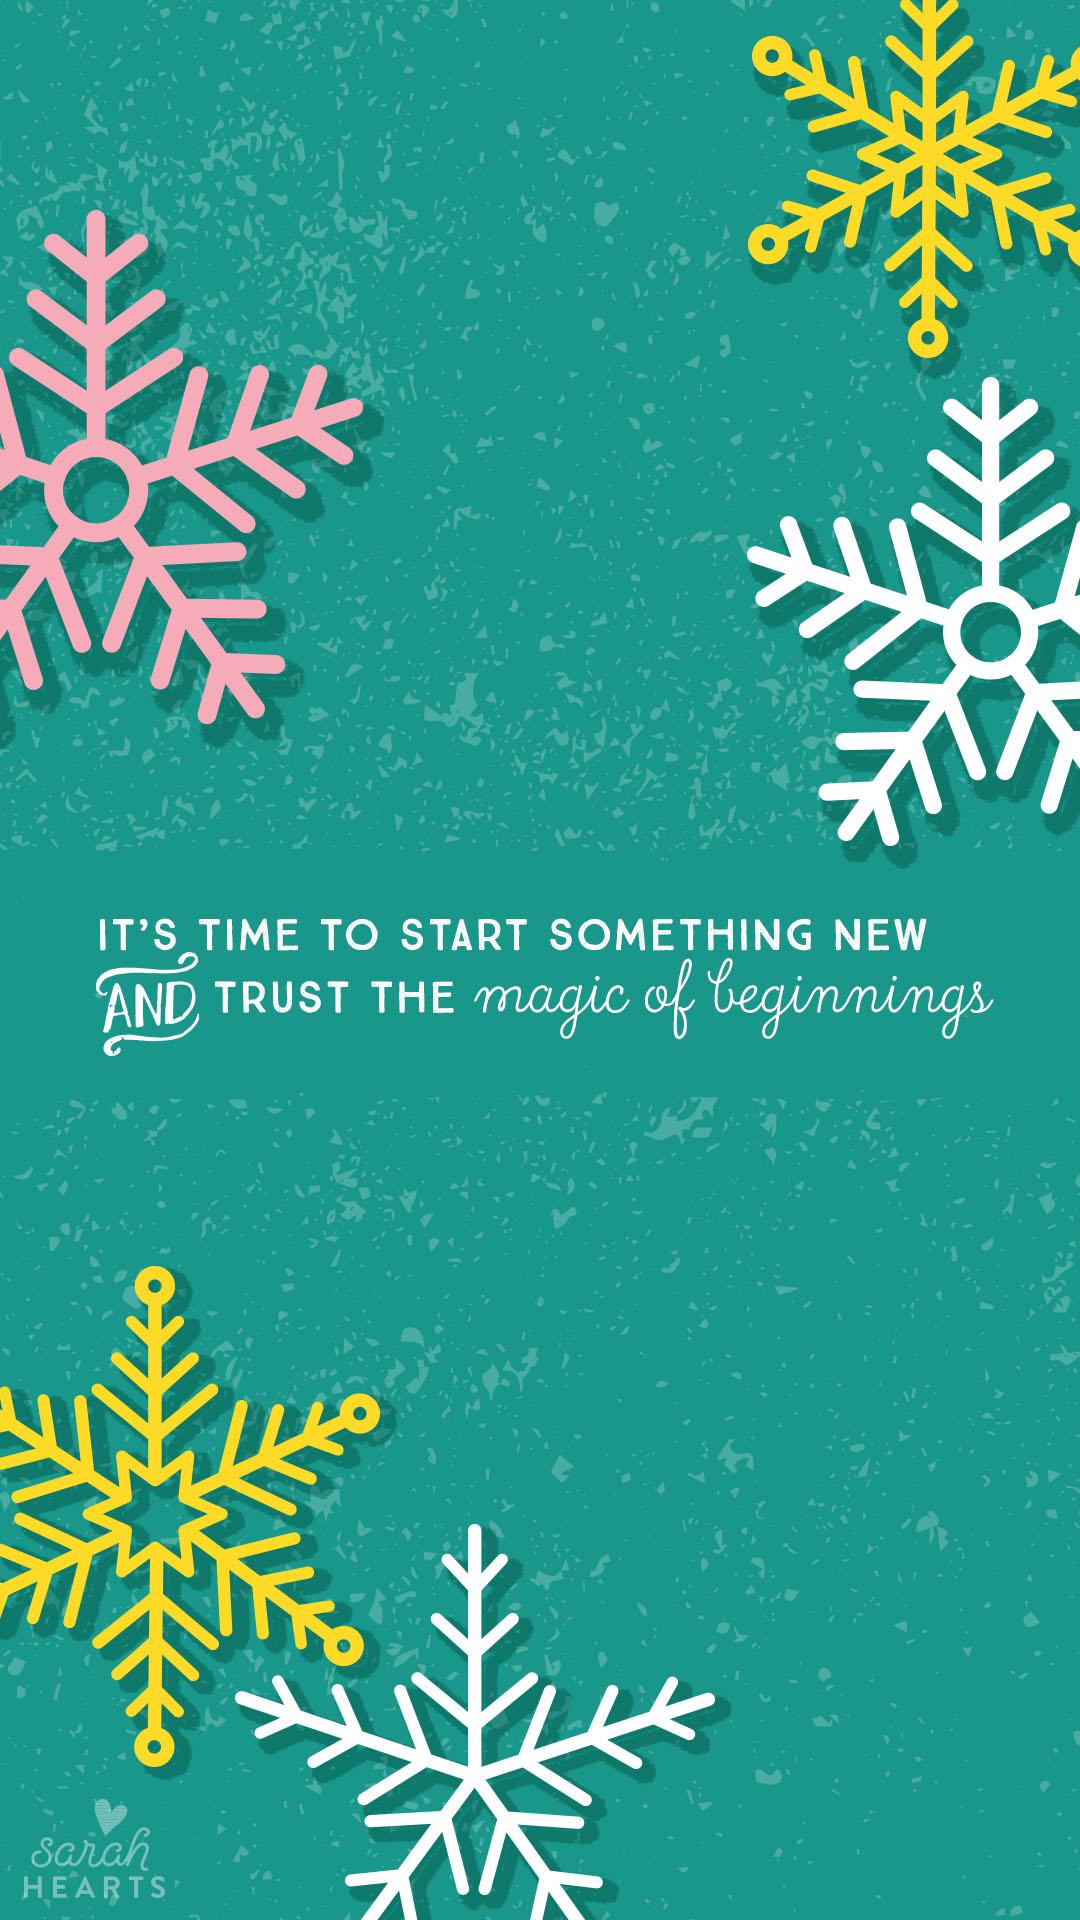 Passion Wallpaper Quote January 2016 Calendar Wallpaper Sarah Hearts